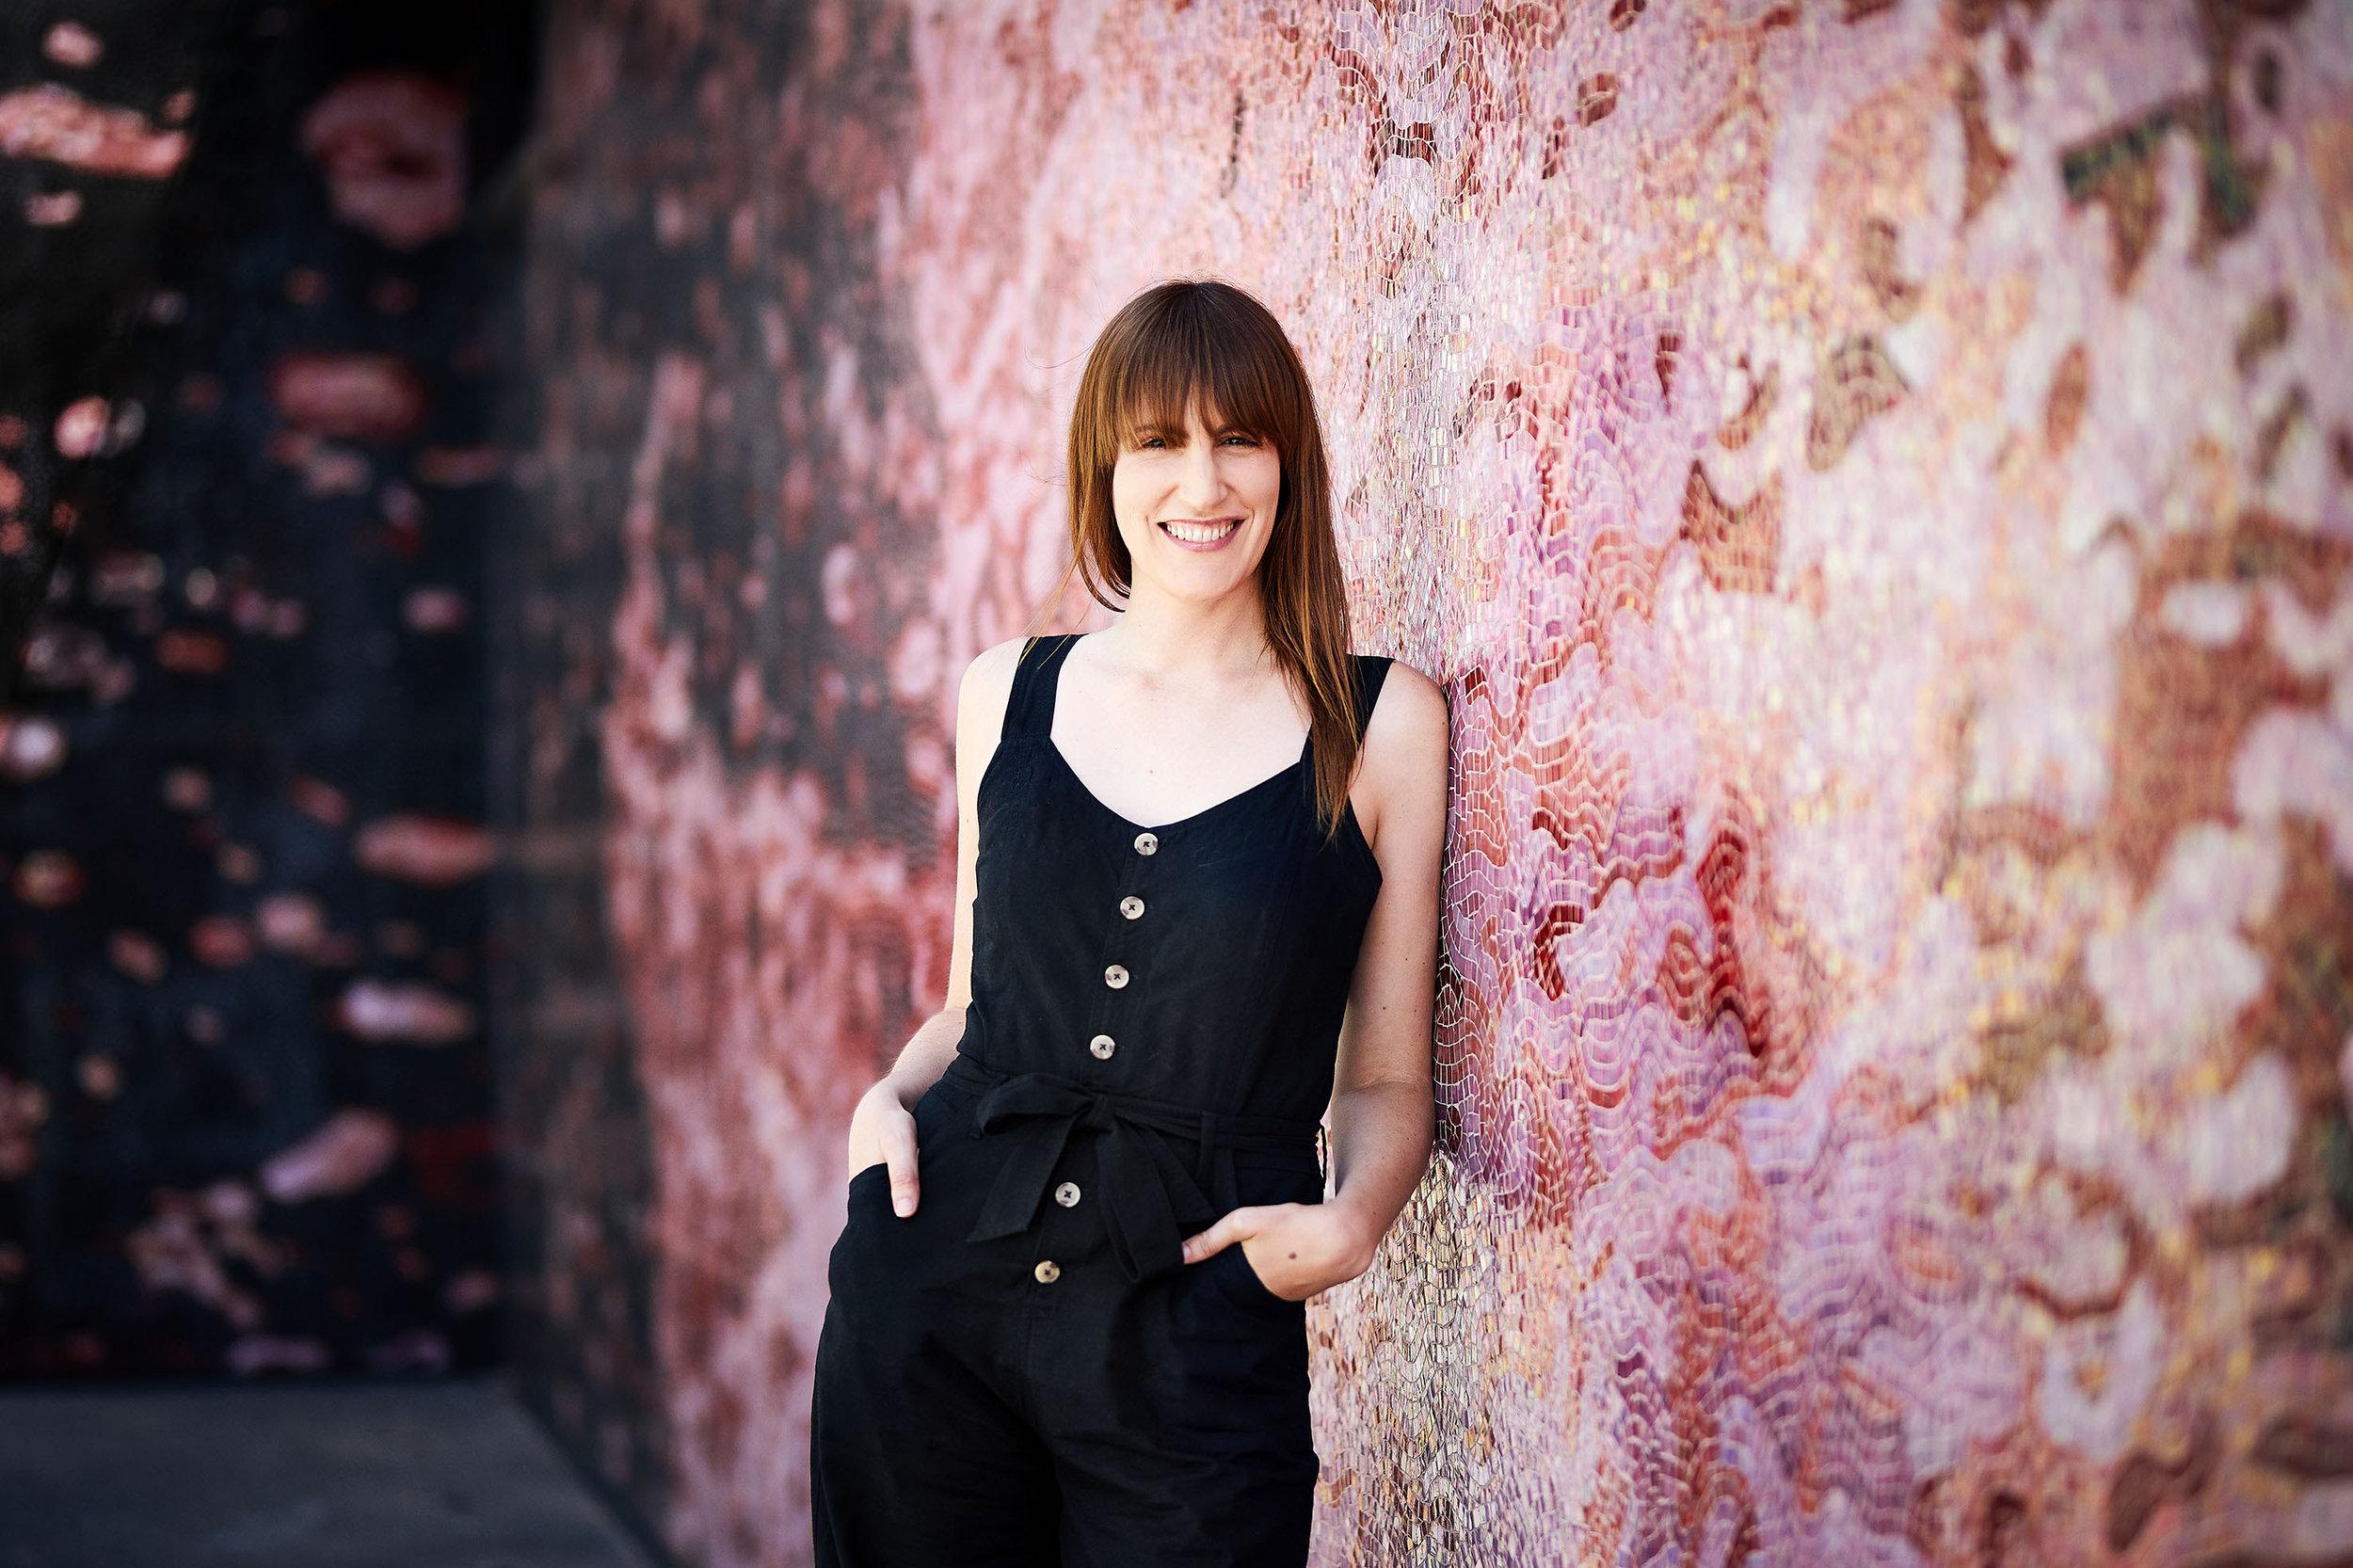 Adriana Begovich, photo by Penny Lane